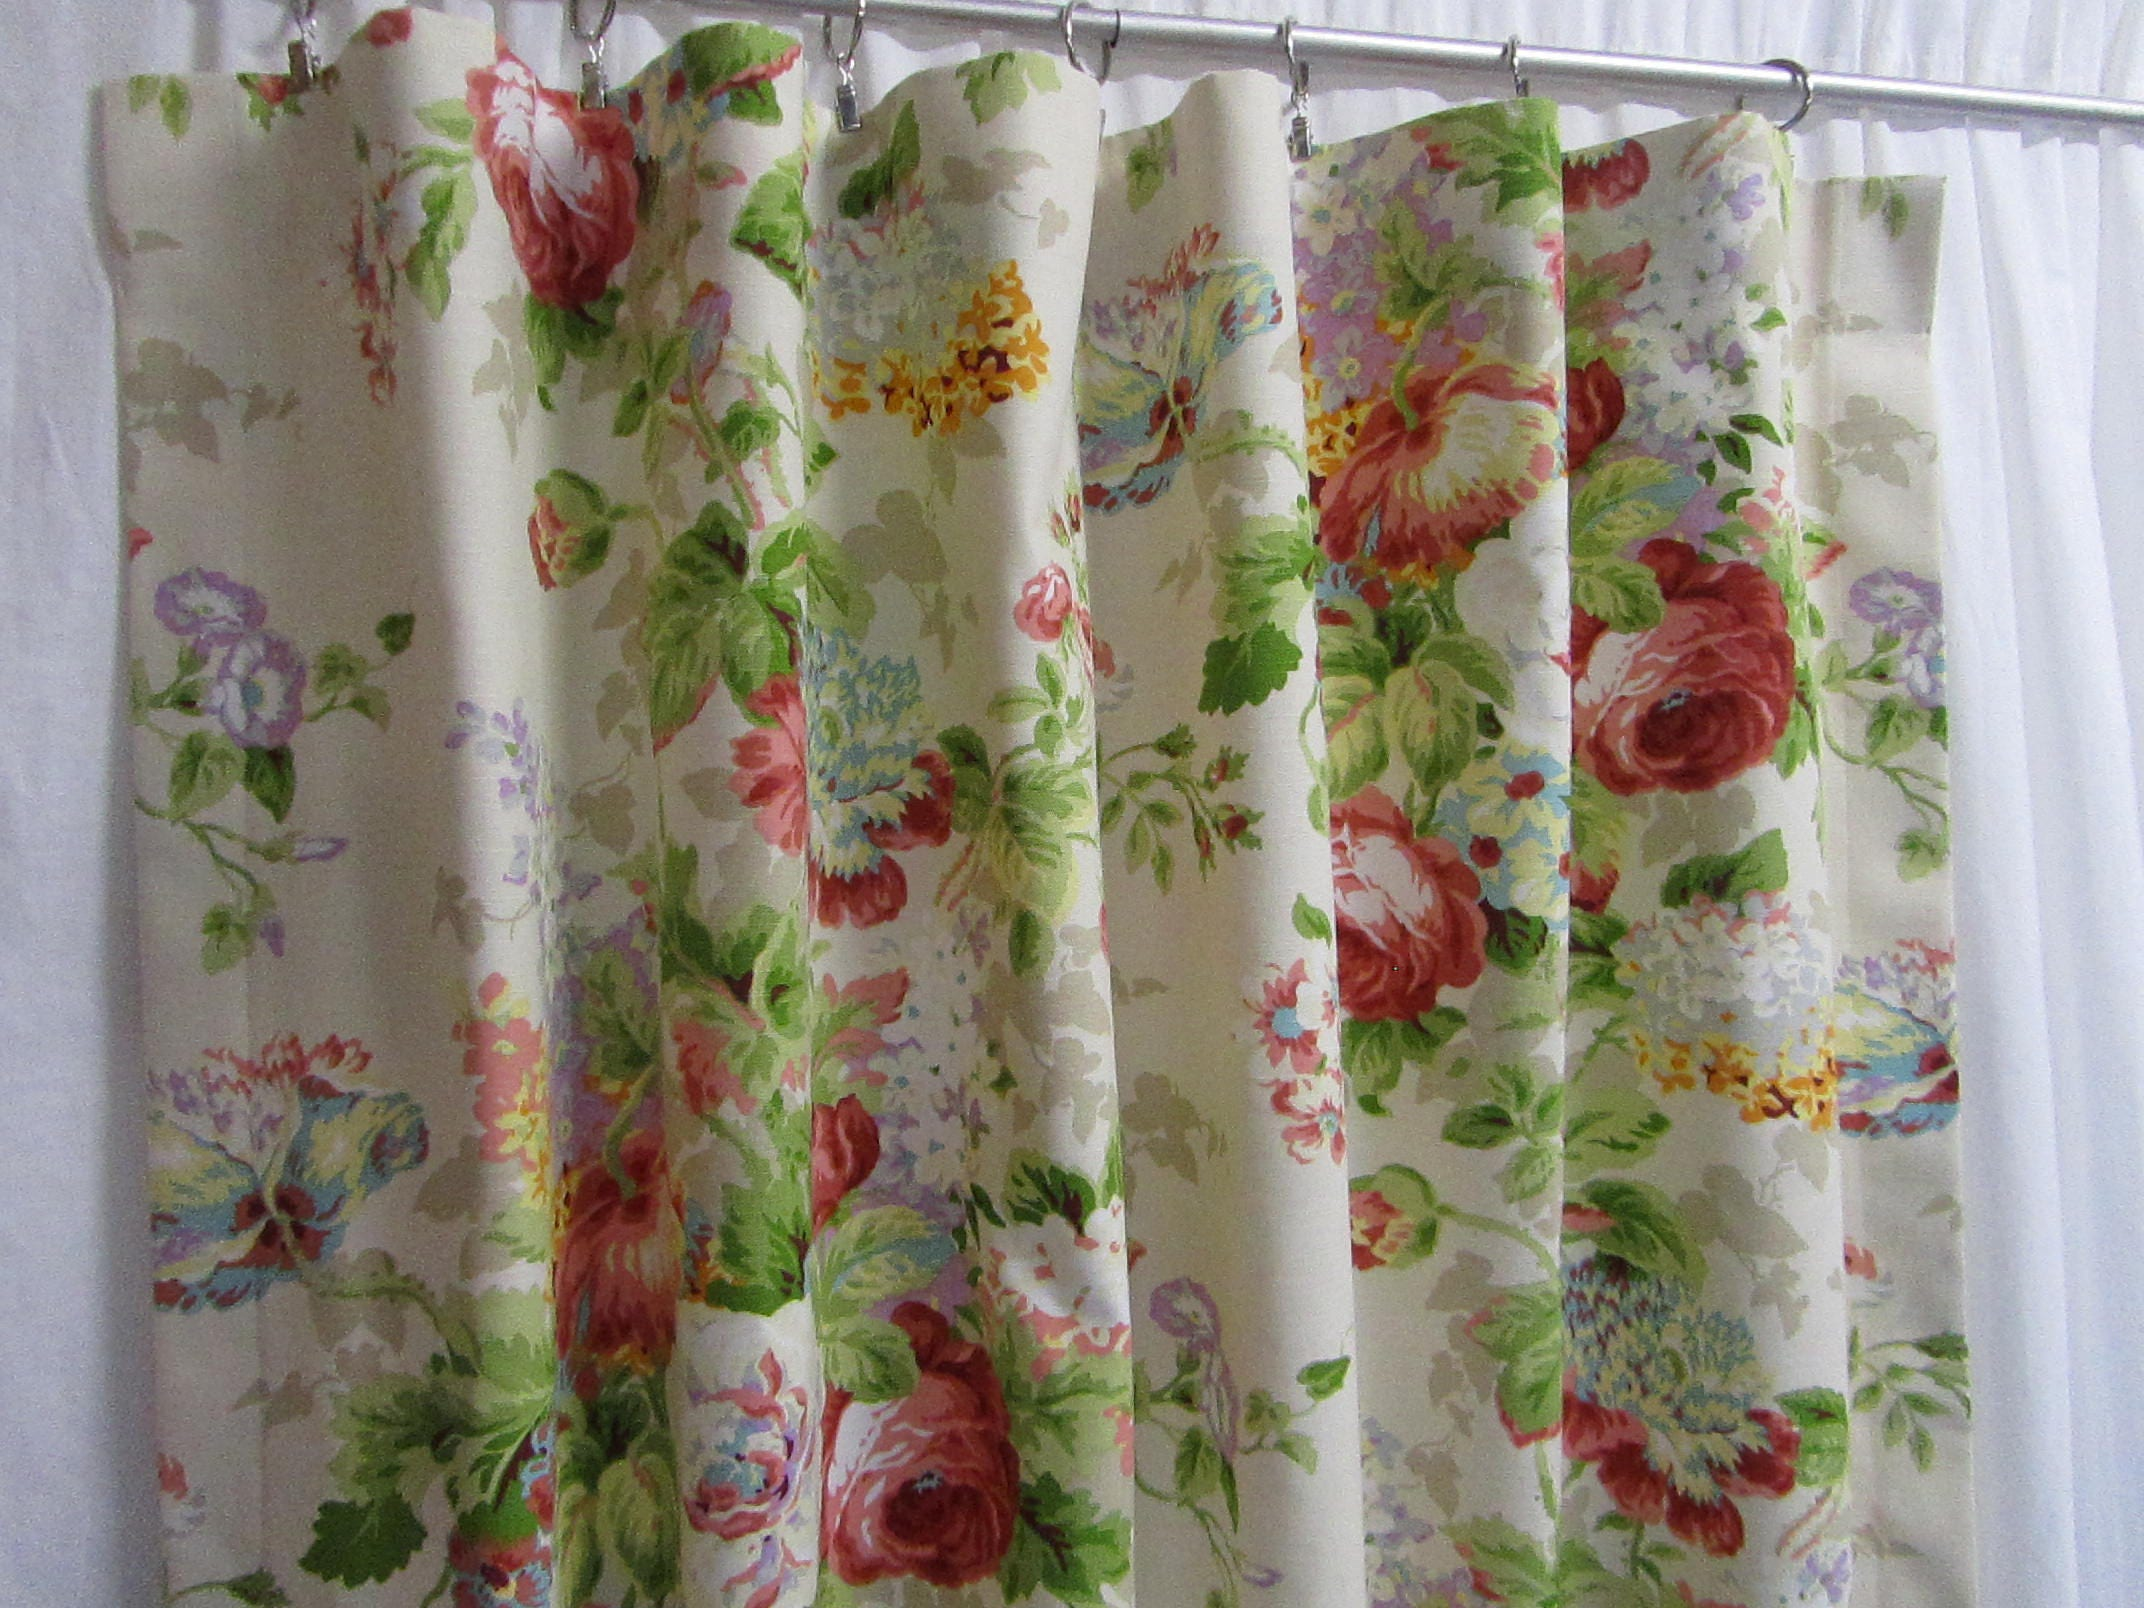 Shabby chic curtains cottage style decor custom rod pocket - Shabby chic curtain poles ...